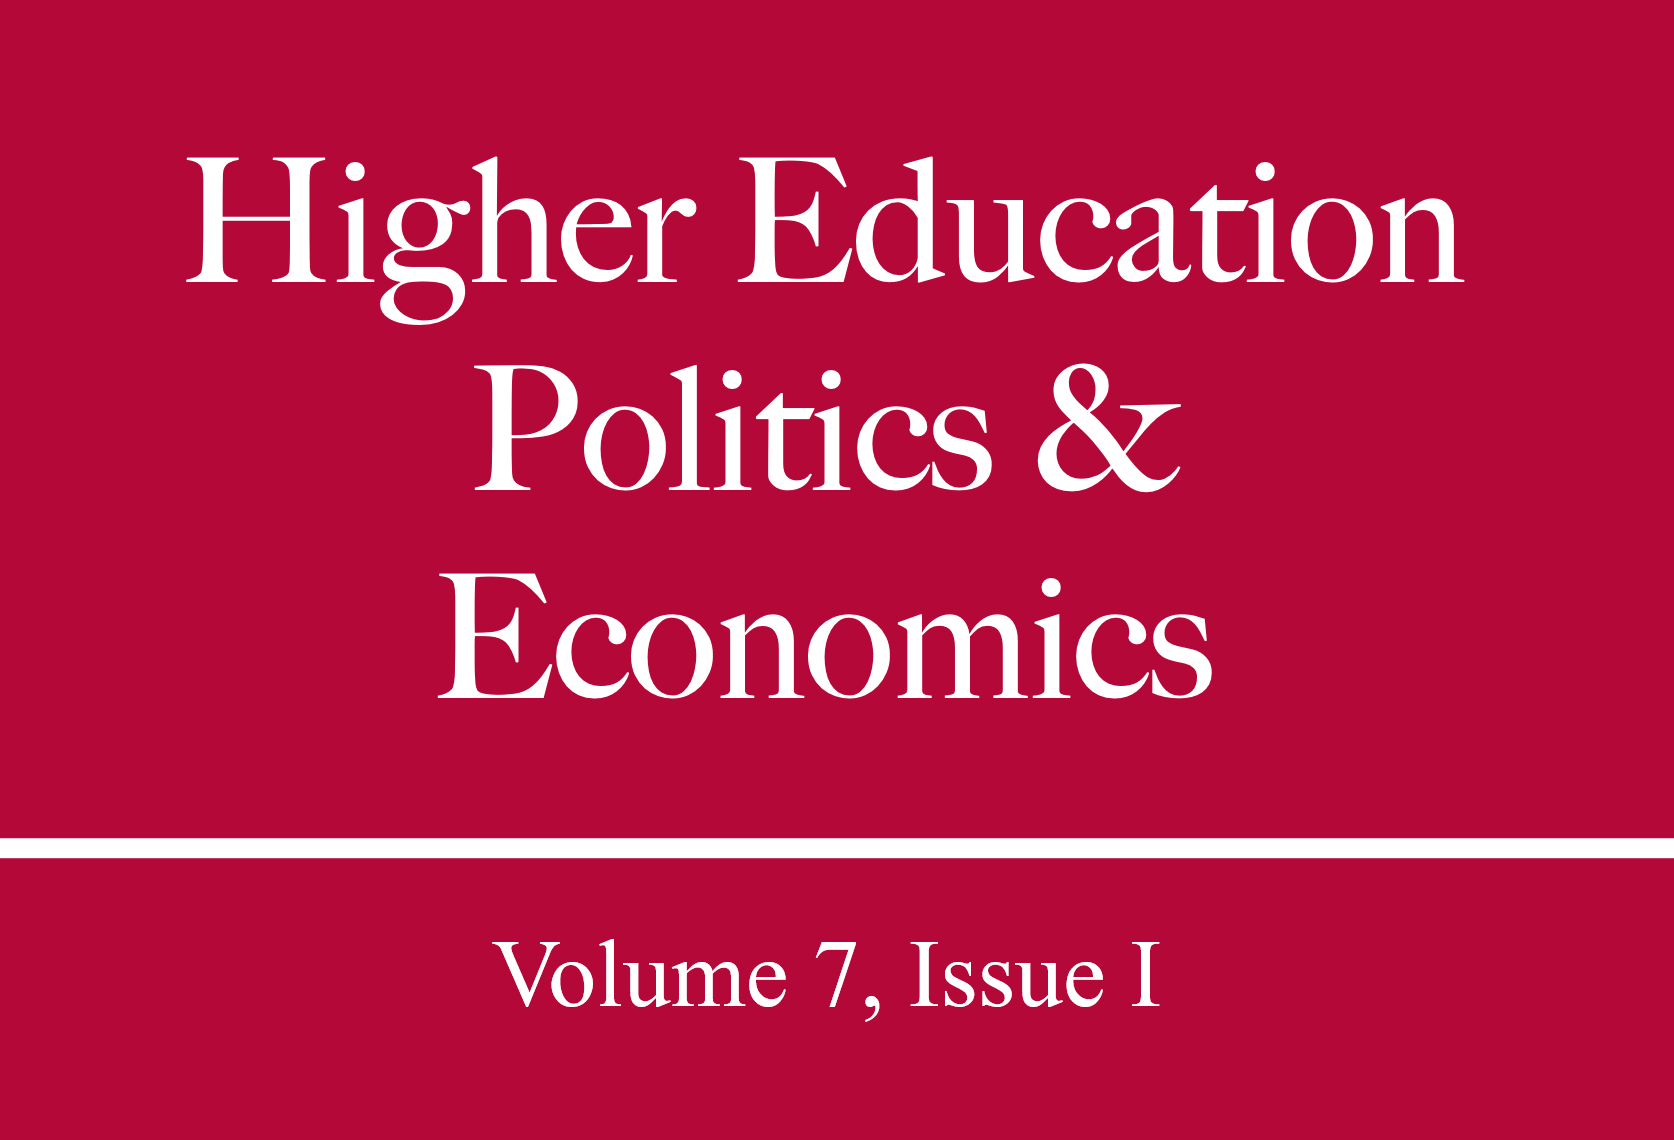 Higher Education Politics and Economics, Volume 7, Issue 1